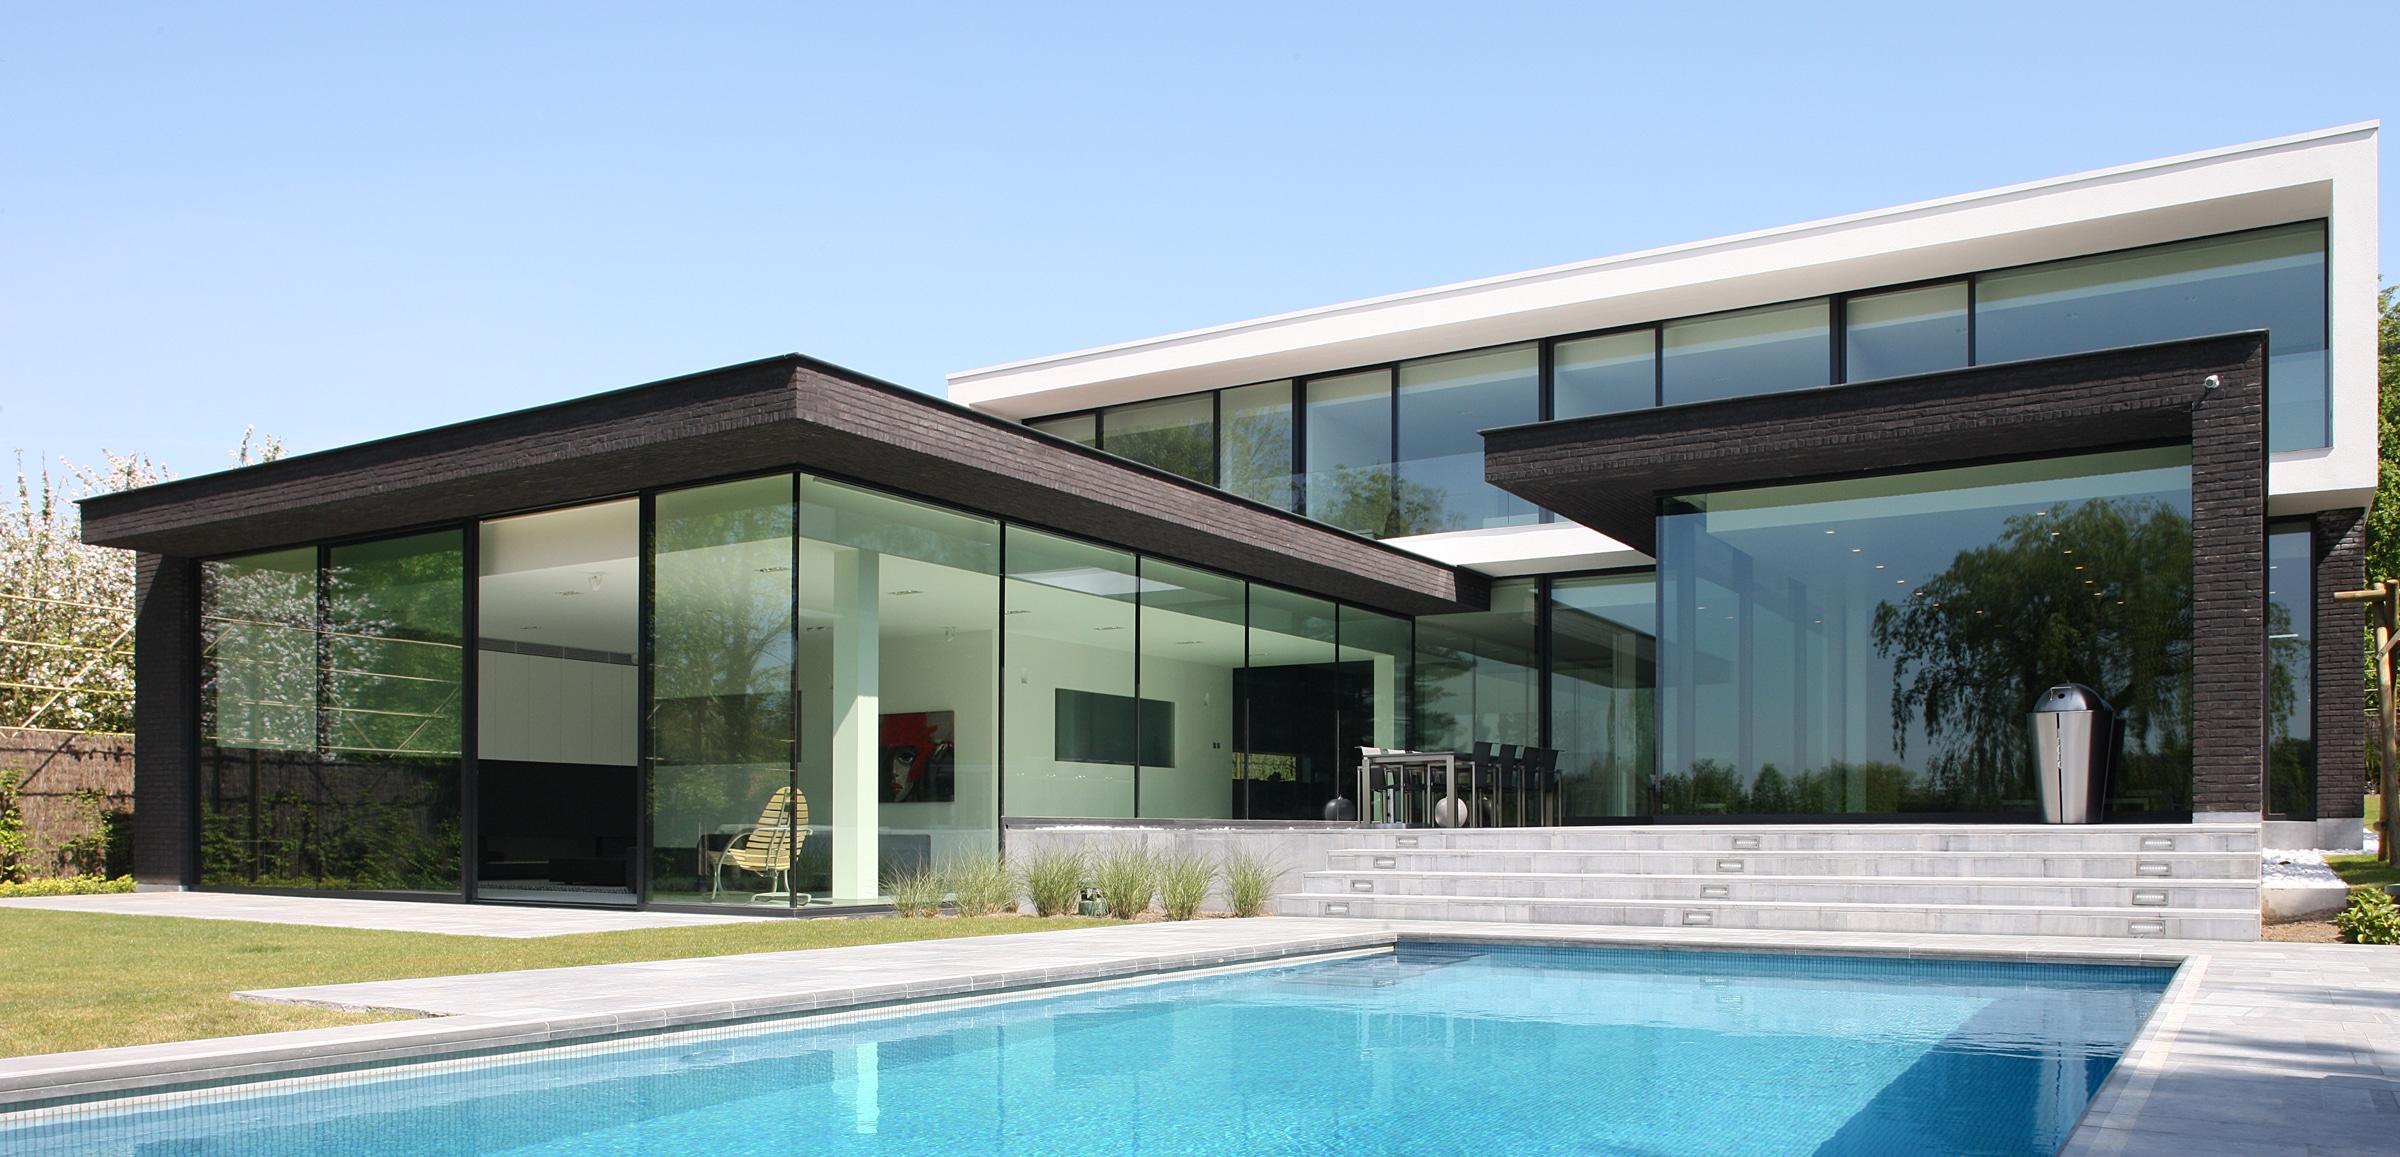 008 Lootens1 | Baeyens & Beck architecten Gent | architect nieuwbouw renovatie interieur | high end | architectenbureau